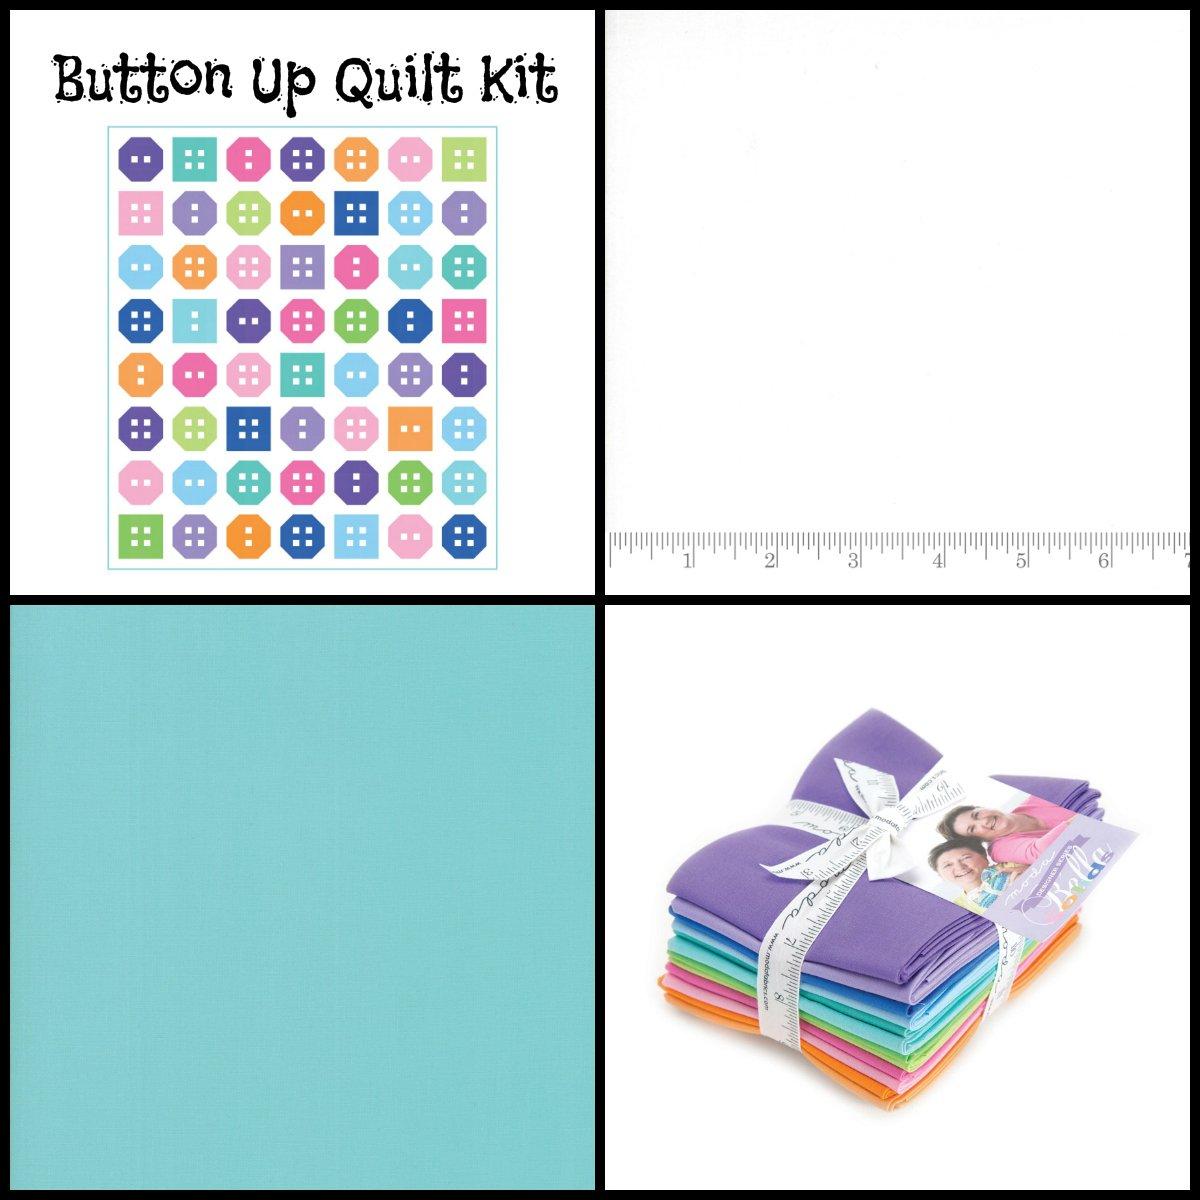 Button Up Quilt Kit (61.5 x 70)